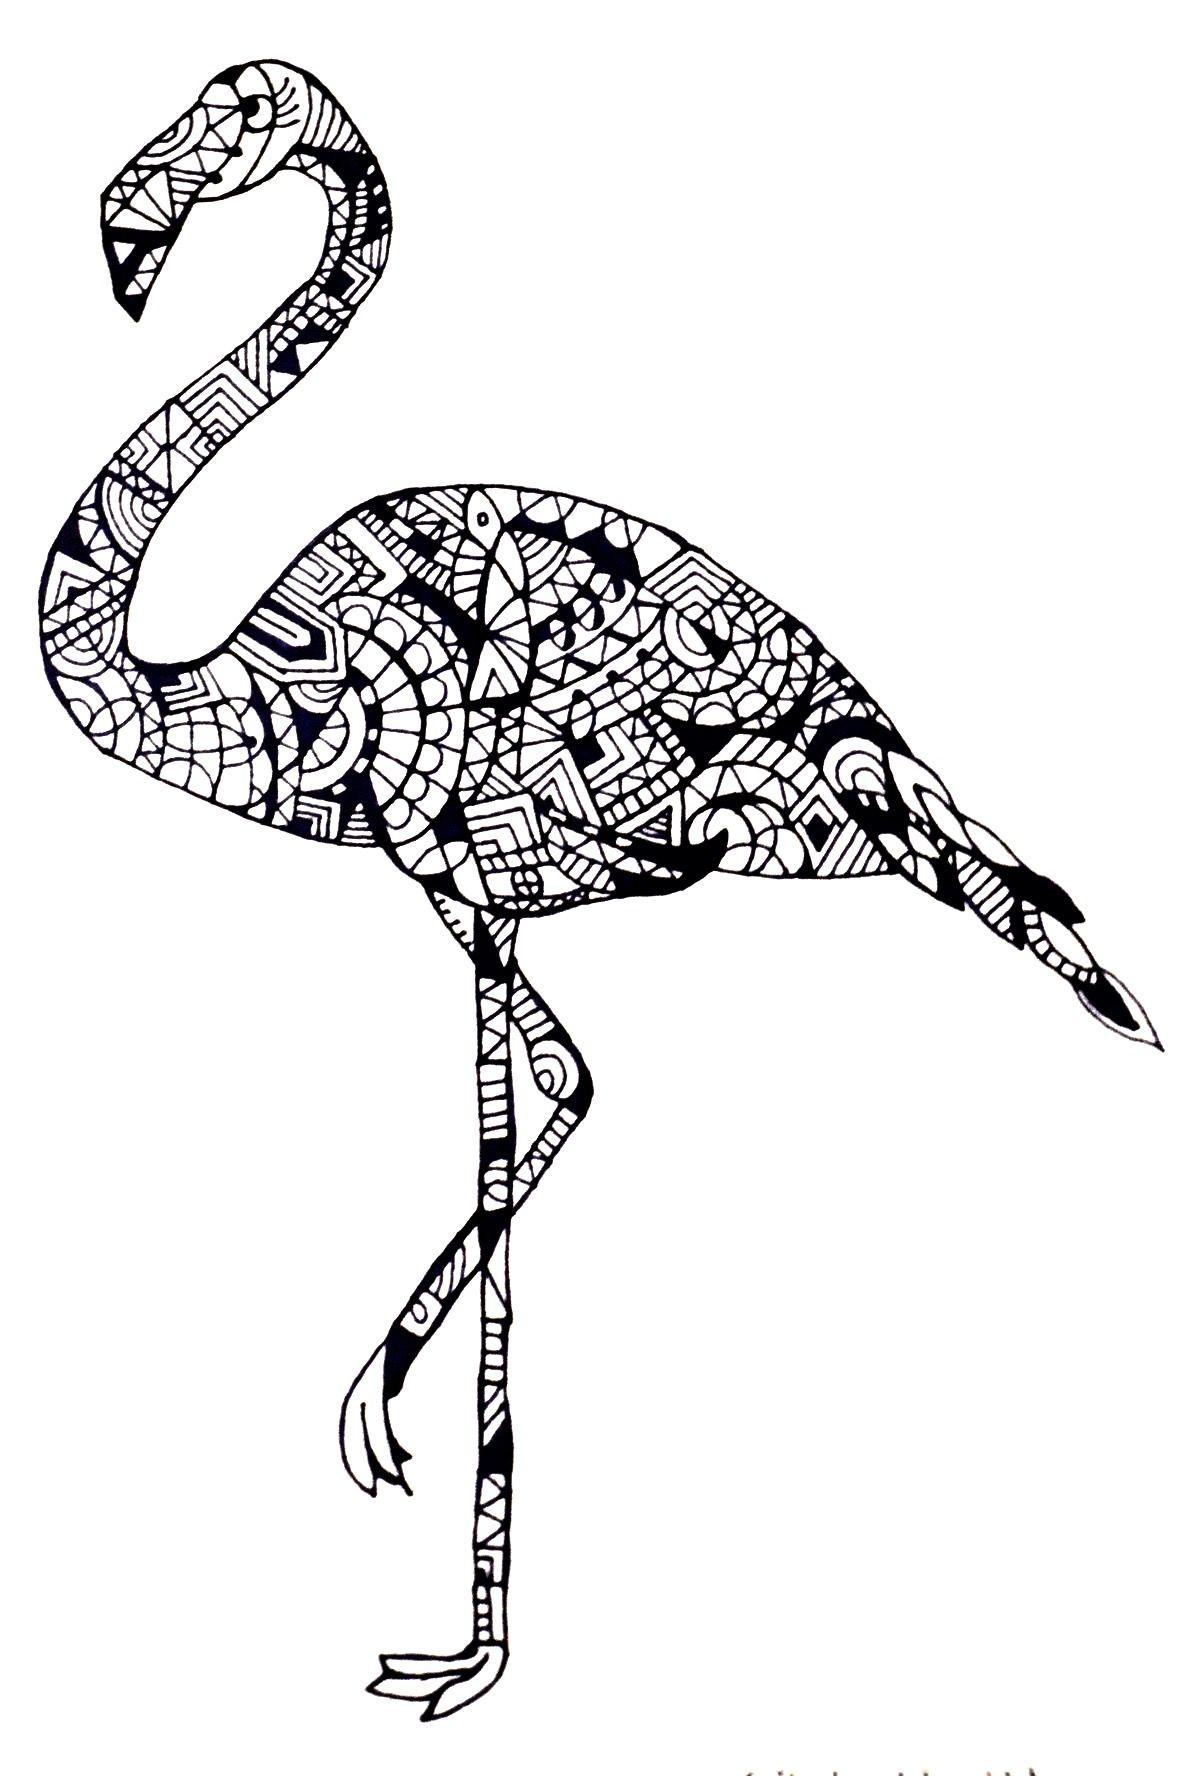 flamingo by cecilie wilsborg 2014 zentangle inspiration ausmalbilder ausmalen windowcolor. Black Bedroom Furniture Sets. Home Design Ideas